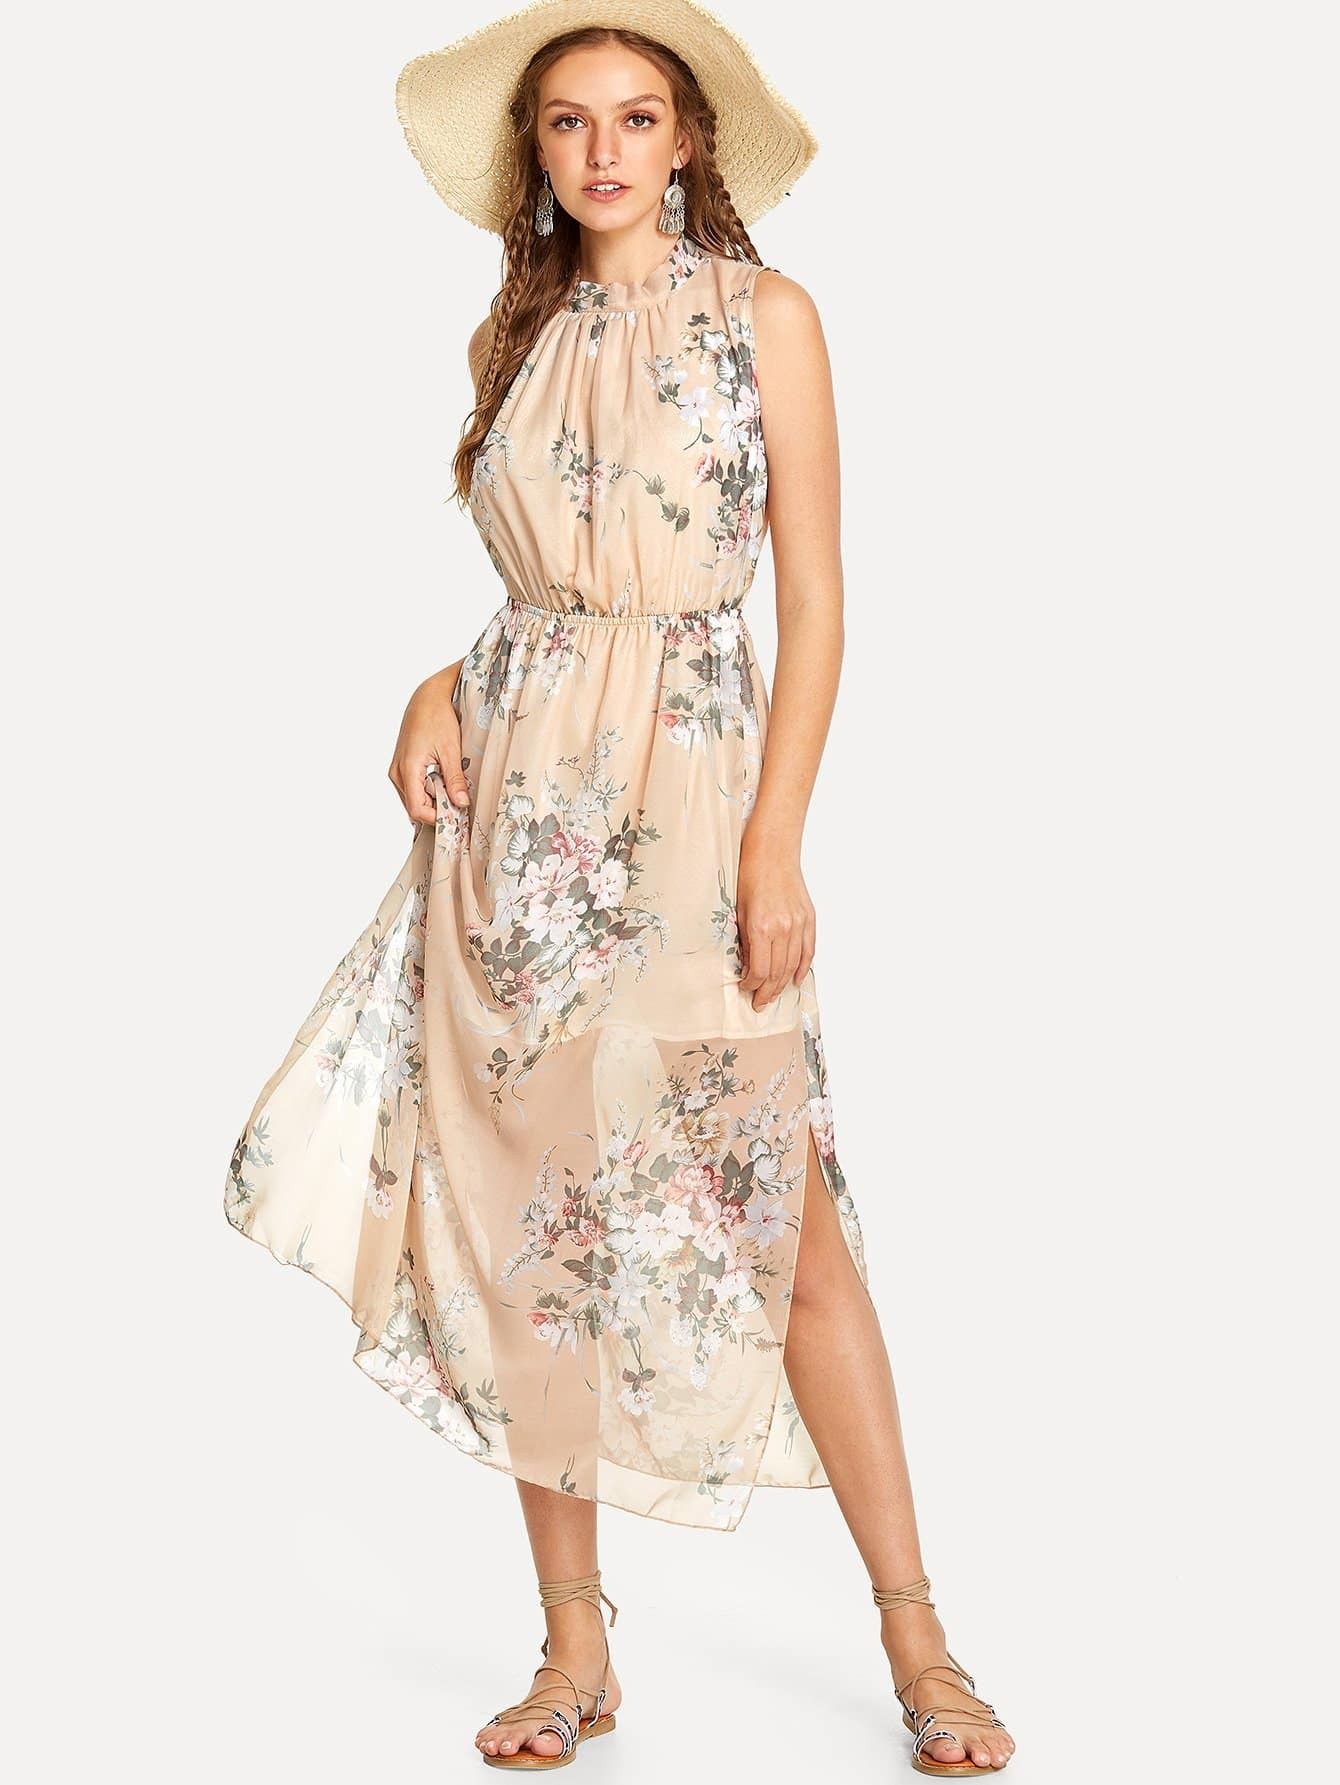 All Over Florals Open Back Chiffon Dress all over florals m slit dress